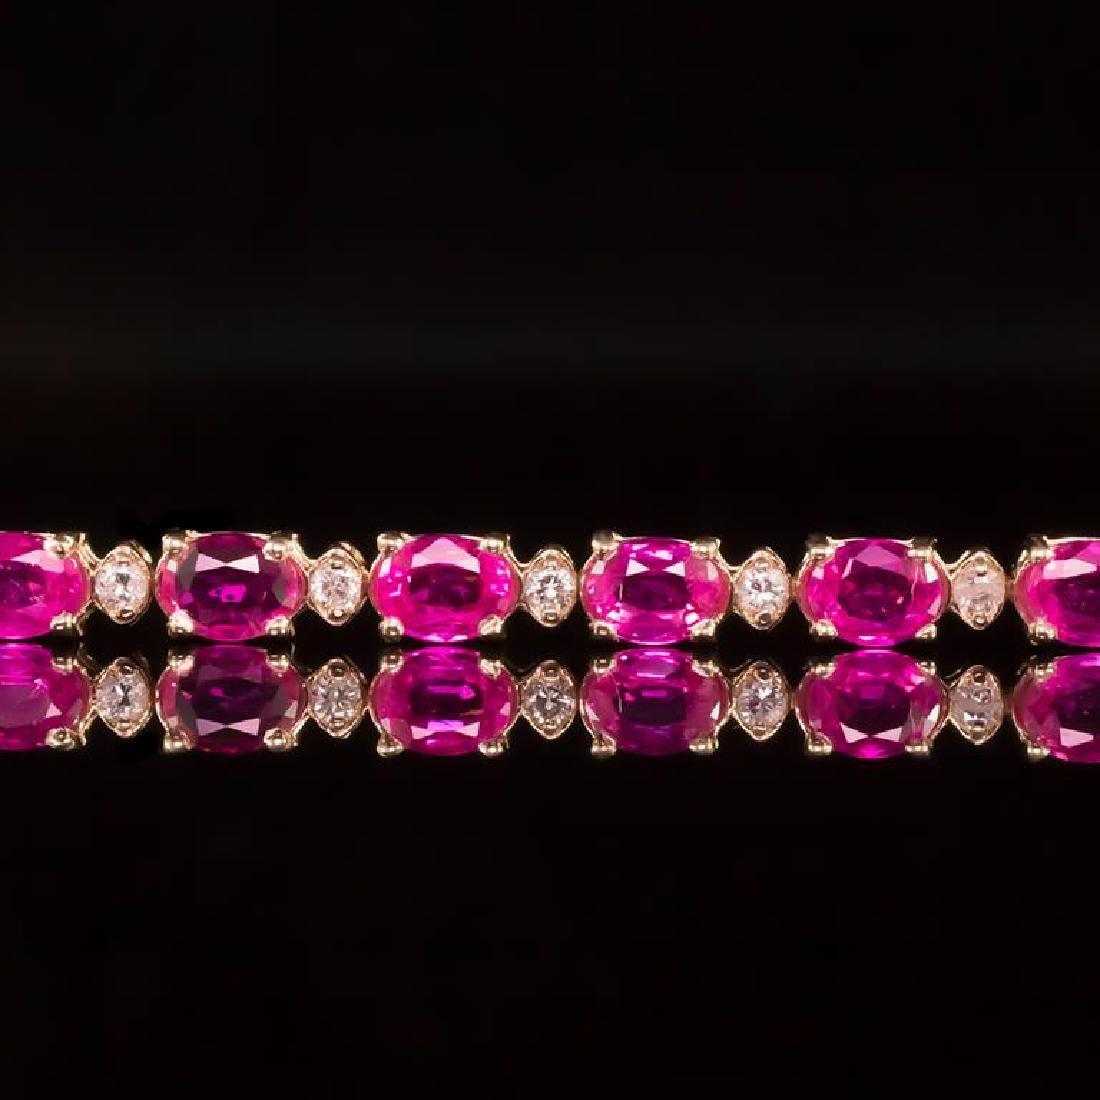 14K Gold 9.36ct Pink Sapphire 0.70ct Diamond Bracelet - 2